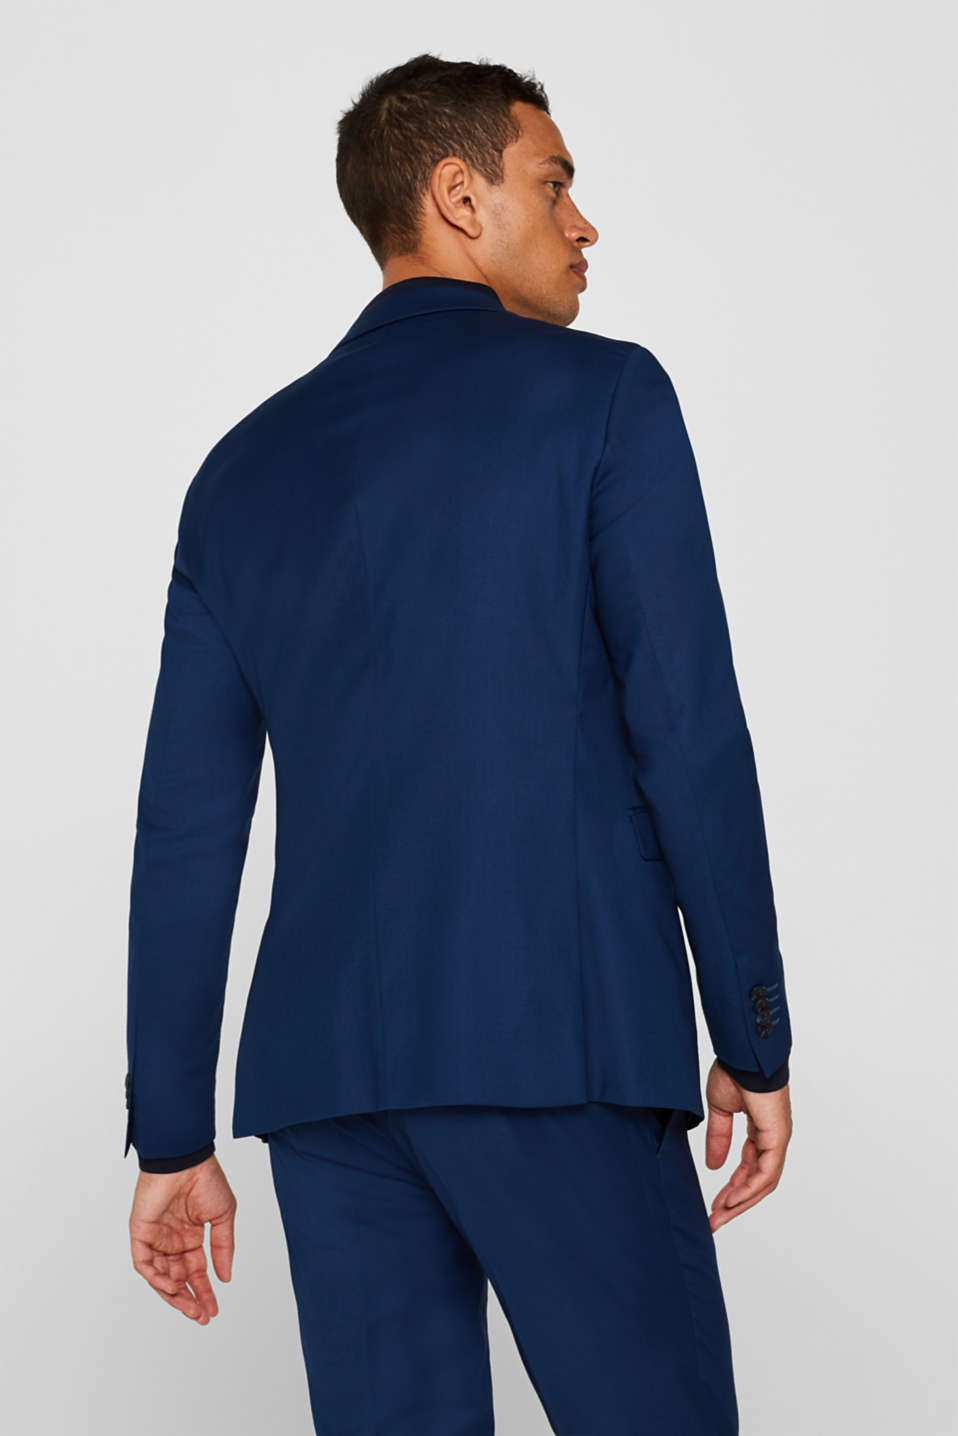 Blazers suit, BLUE, detail image number 3